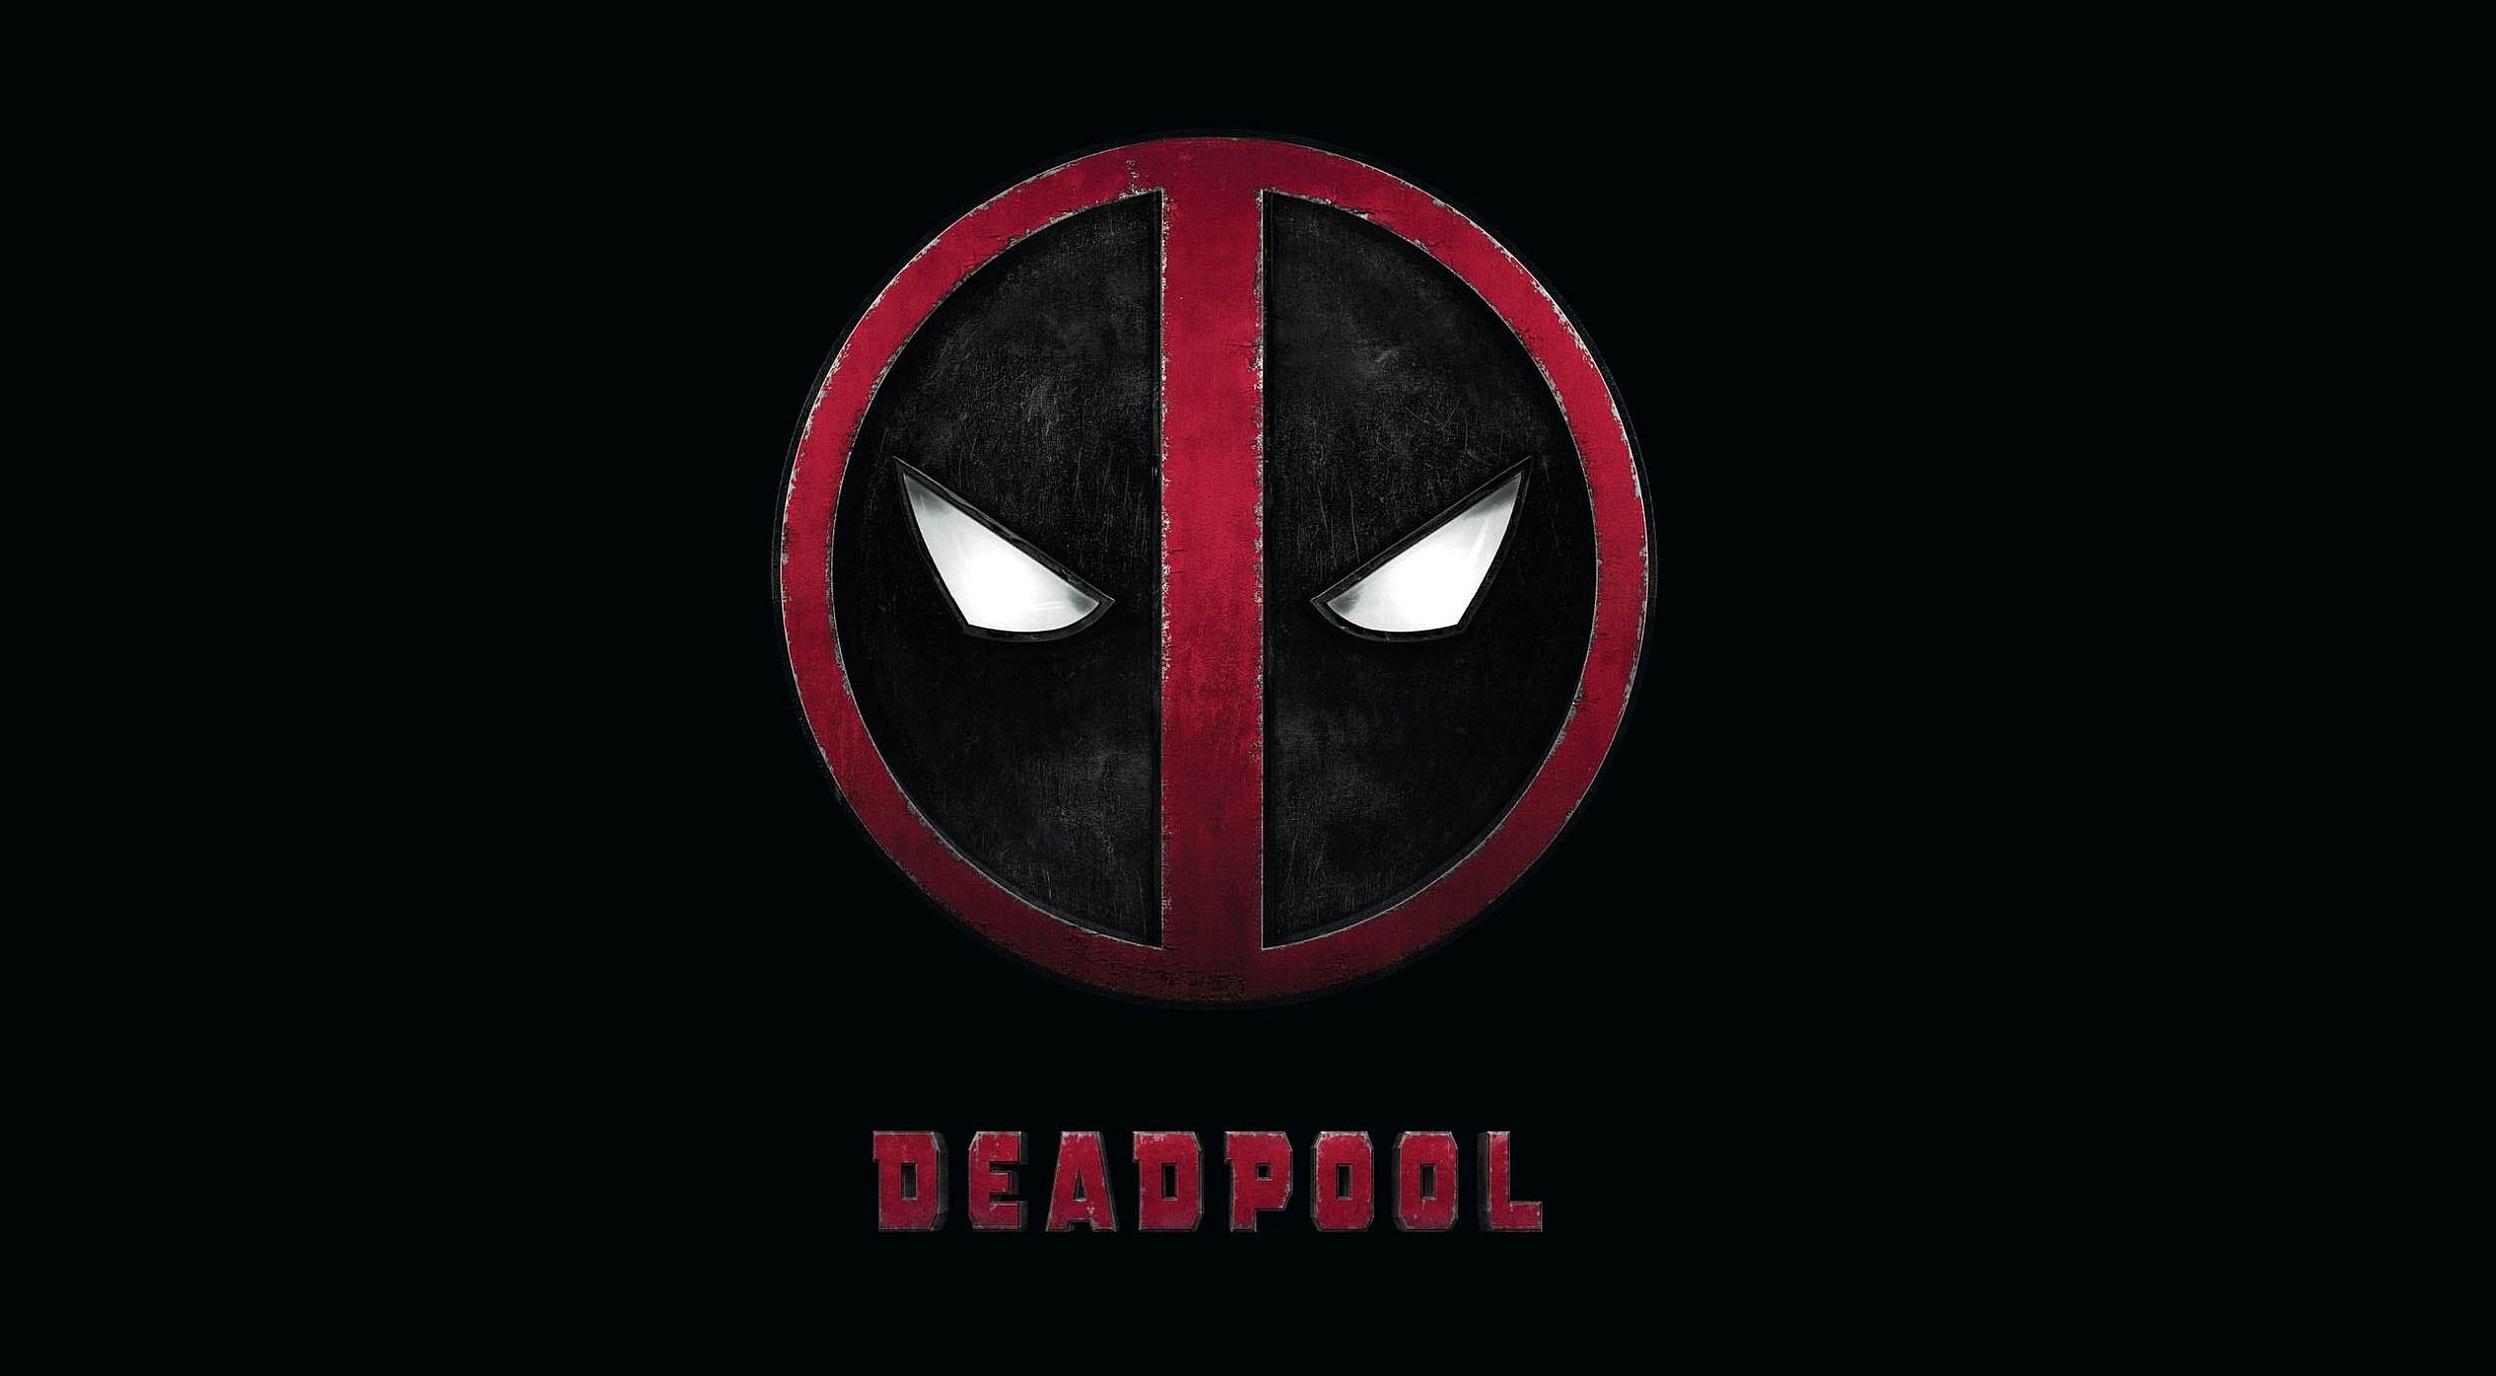 deadpool logo - photo #30